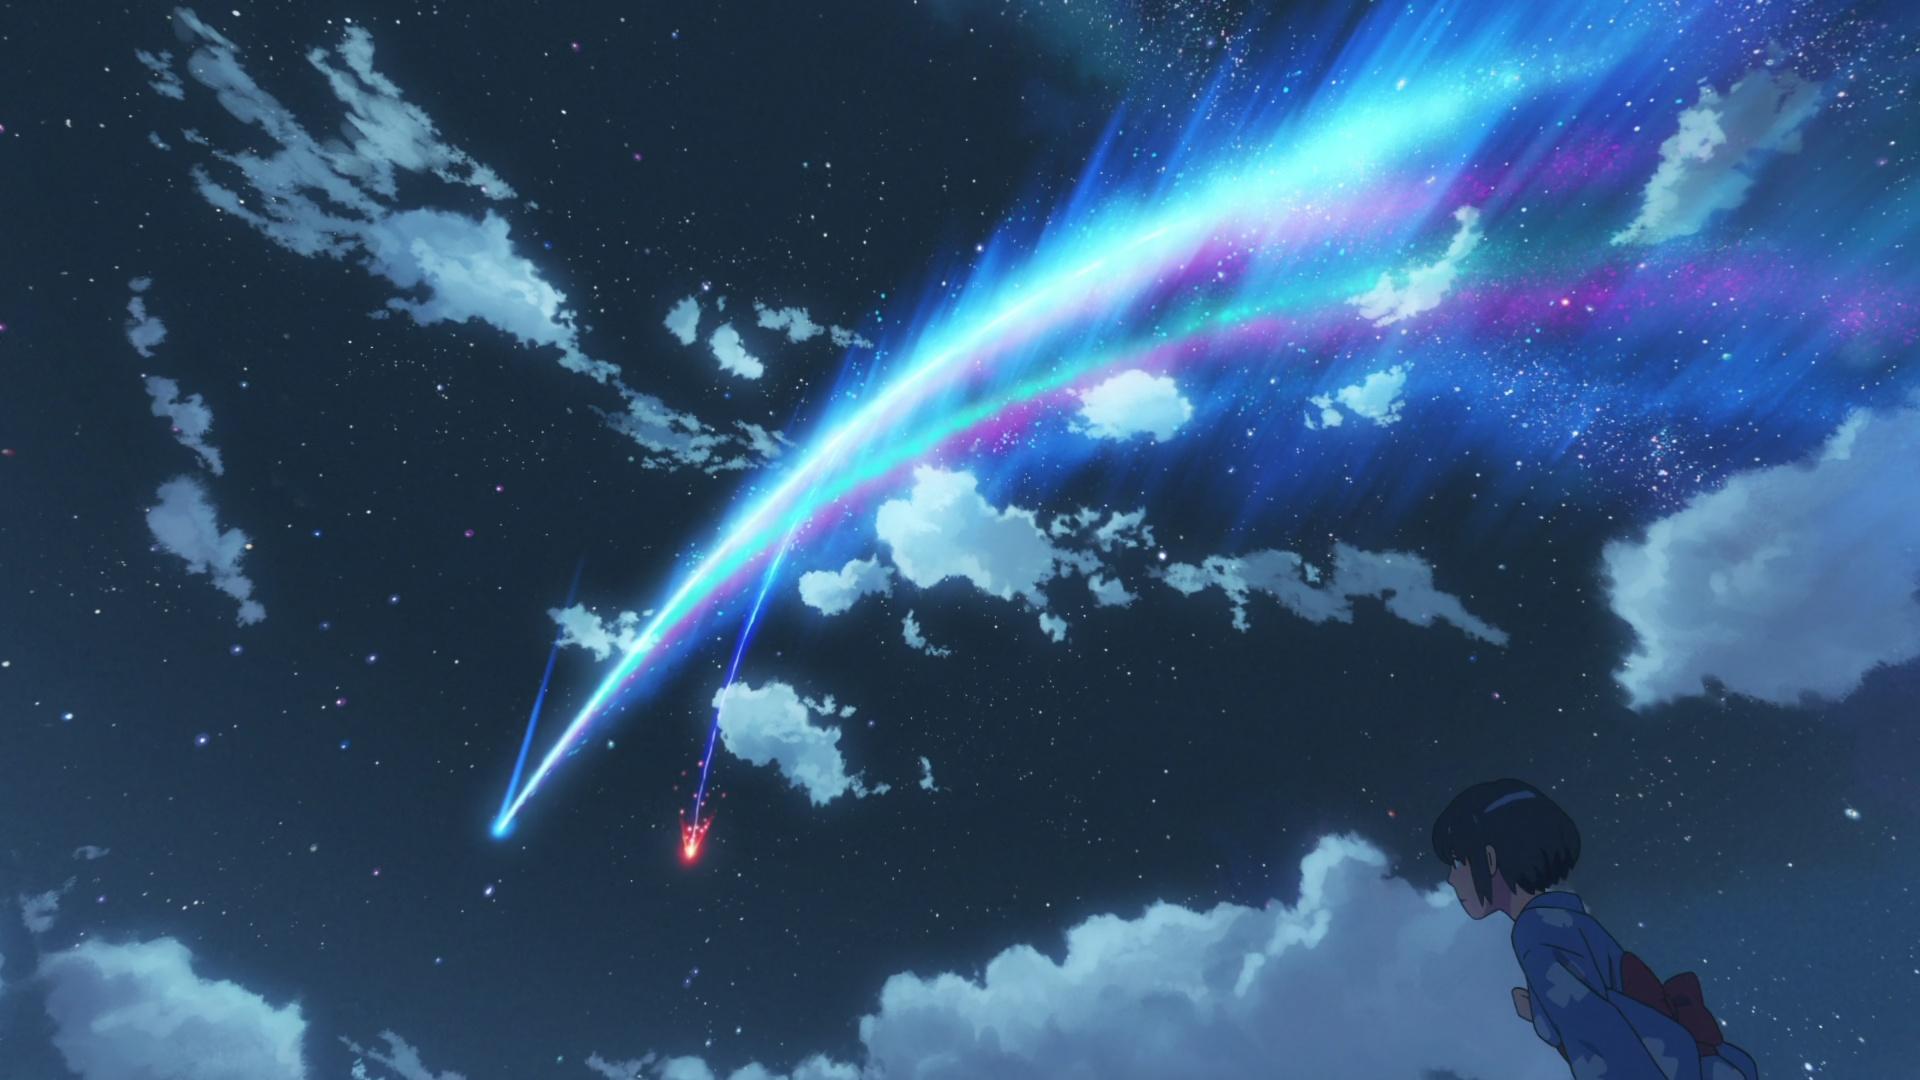 Comet Tiamat | Makoto Shinkai Wiki | FANDOM powered by Wikia